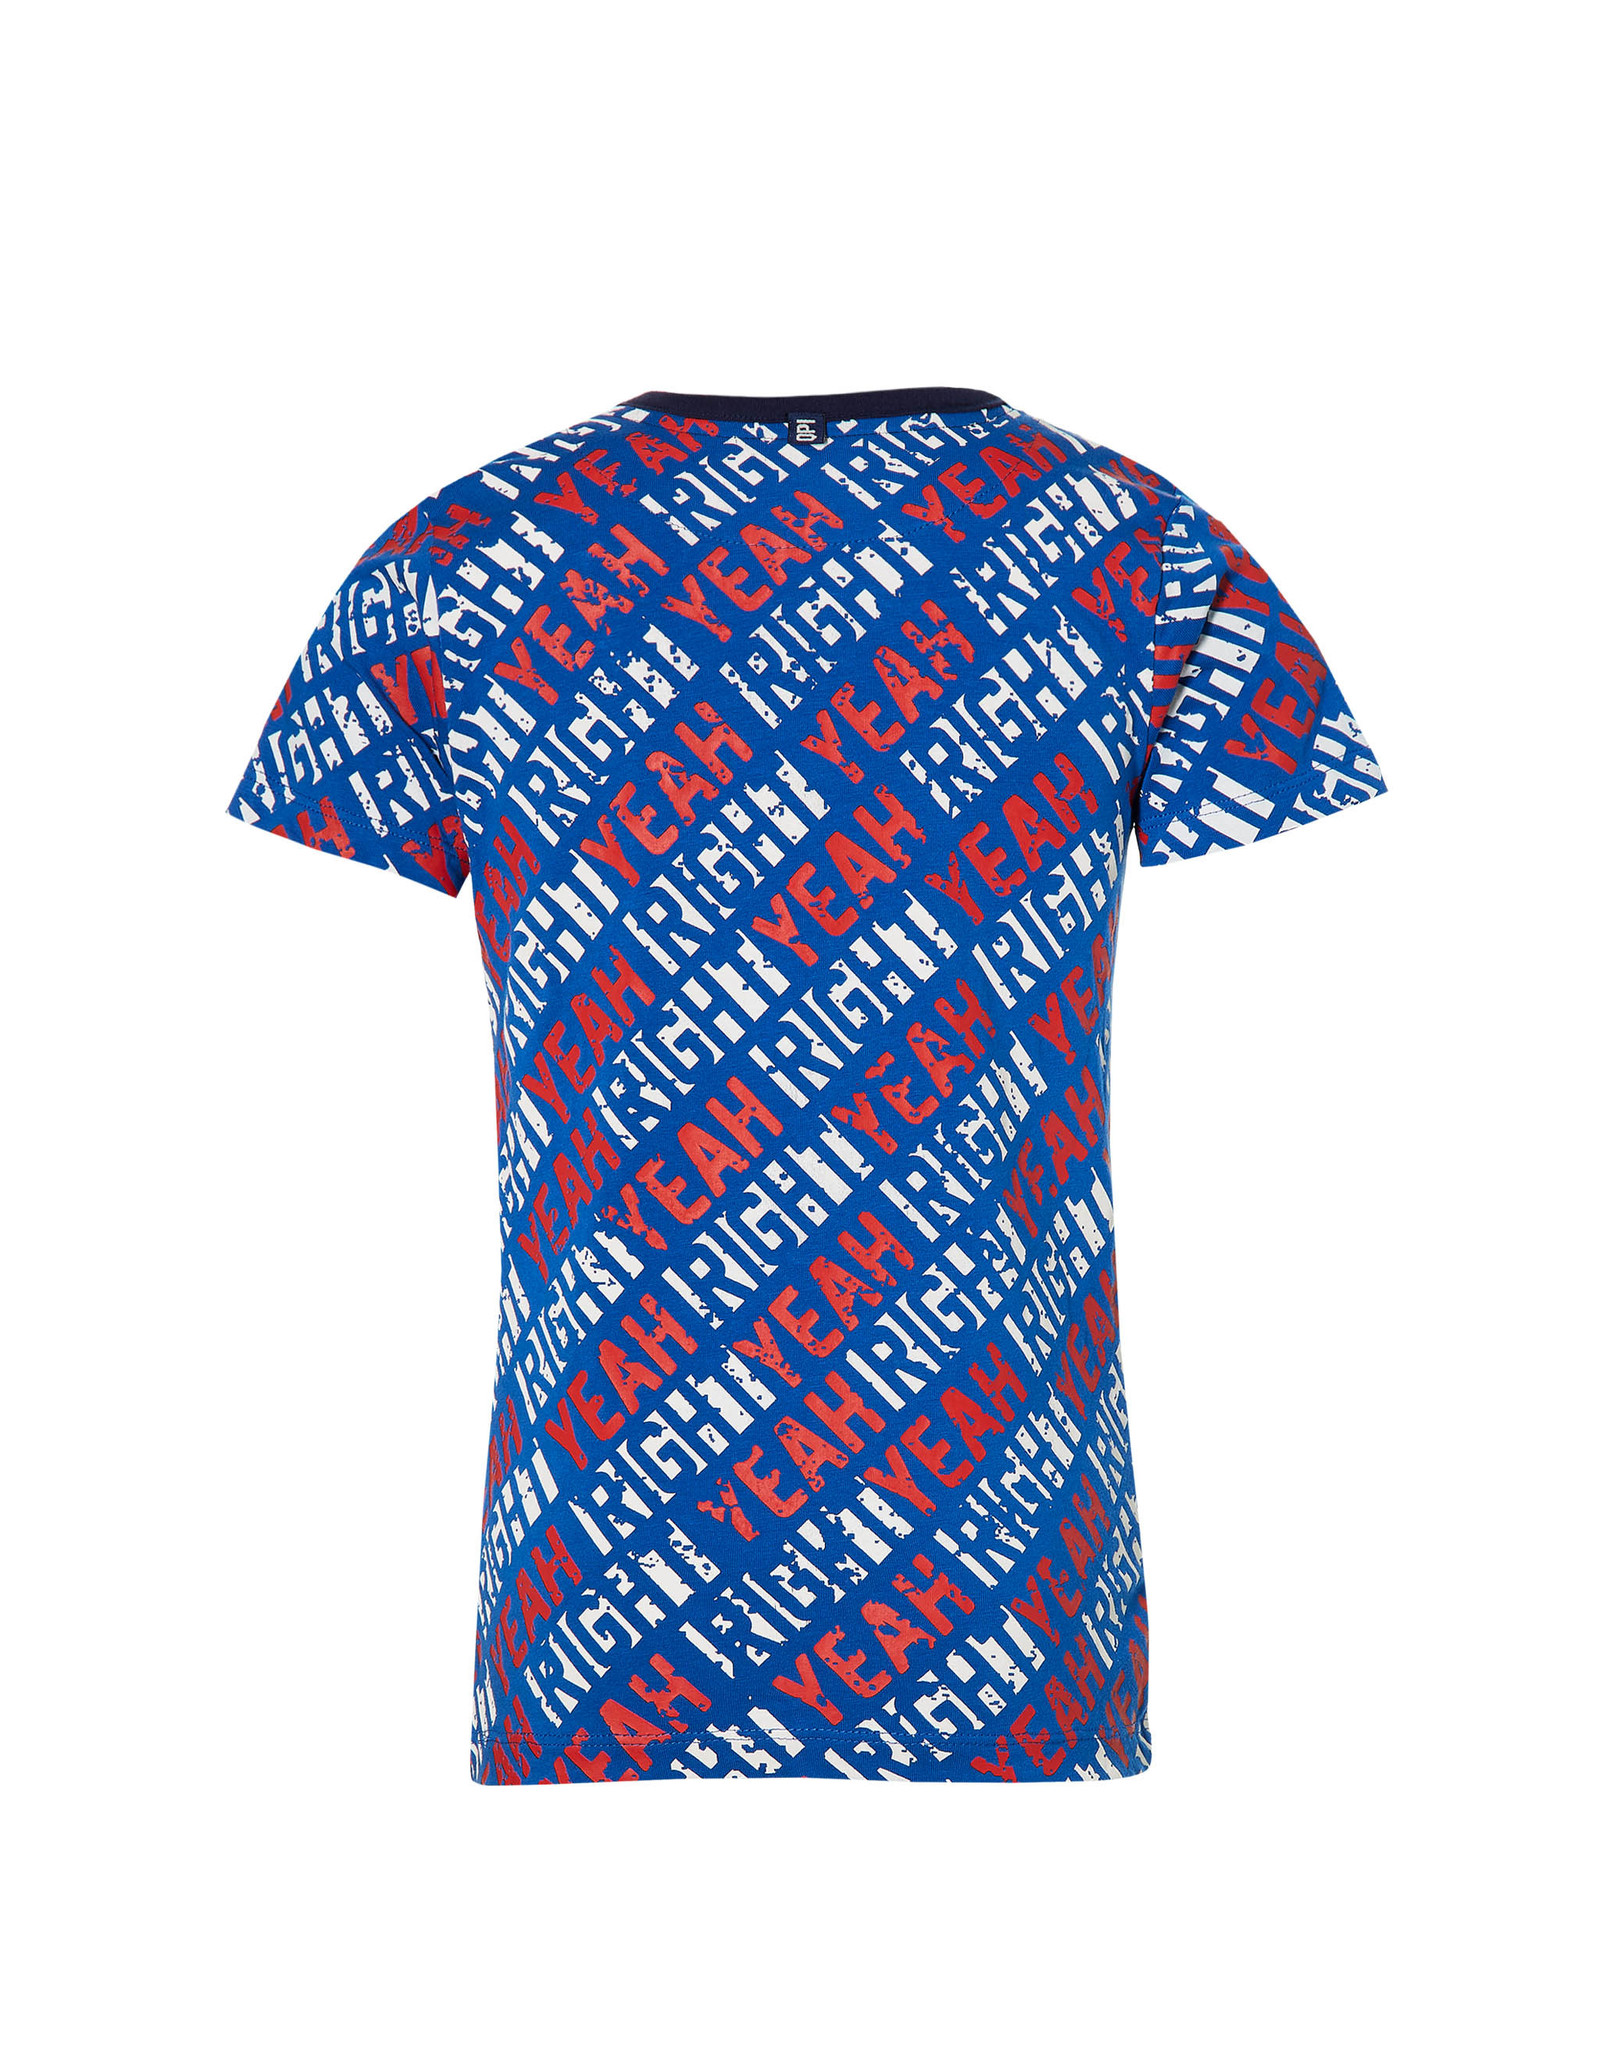 Quapi DAAF W201 Olympian Blue Text Stripe